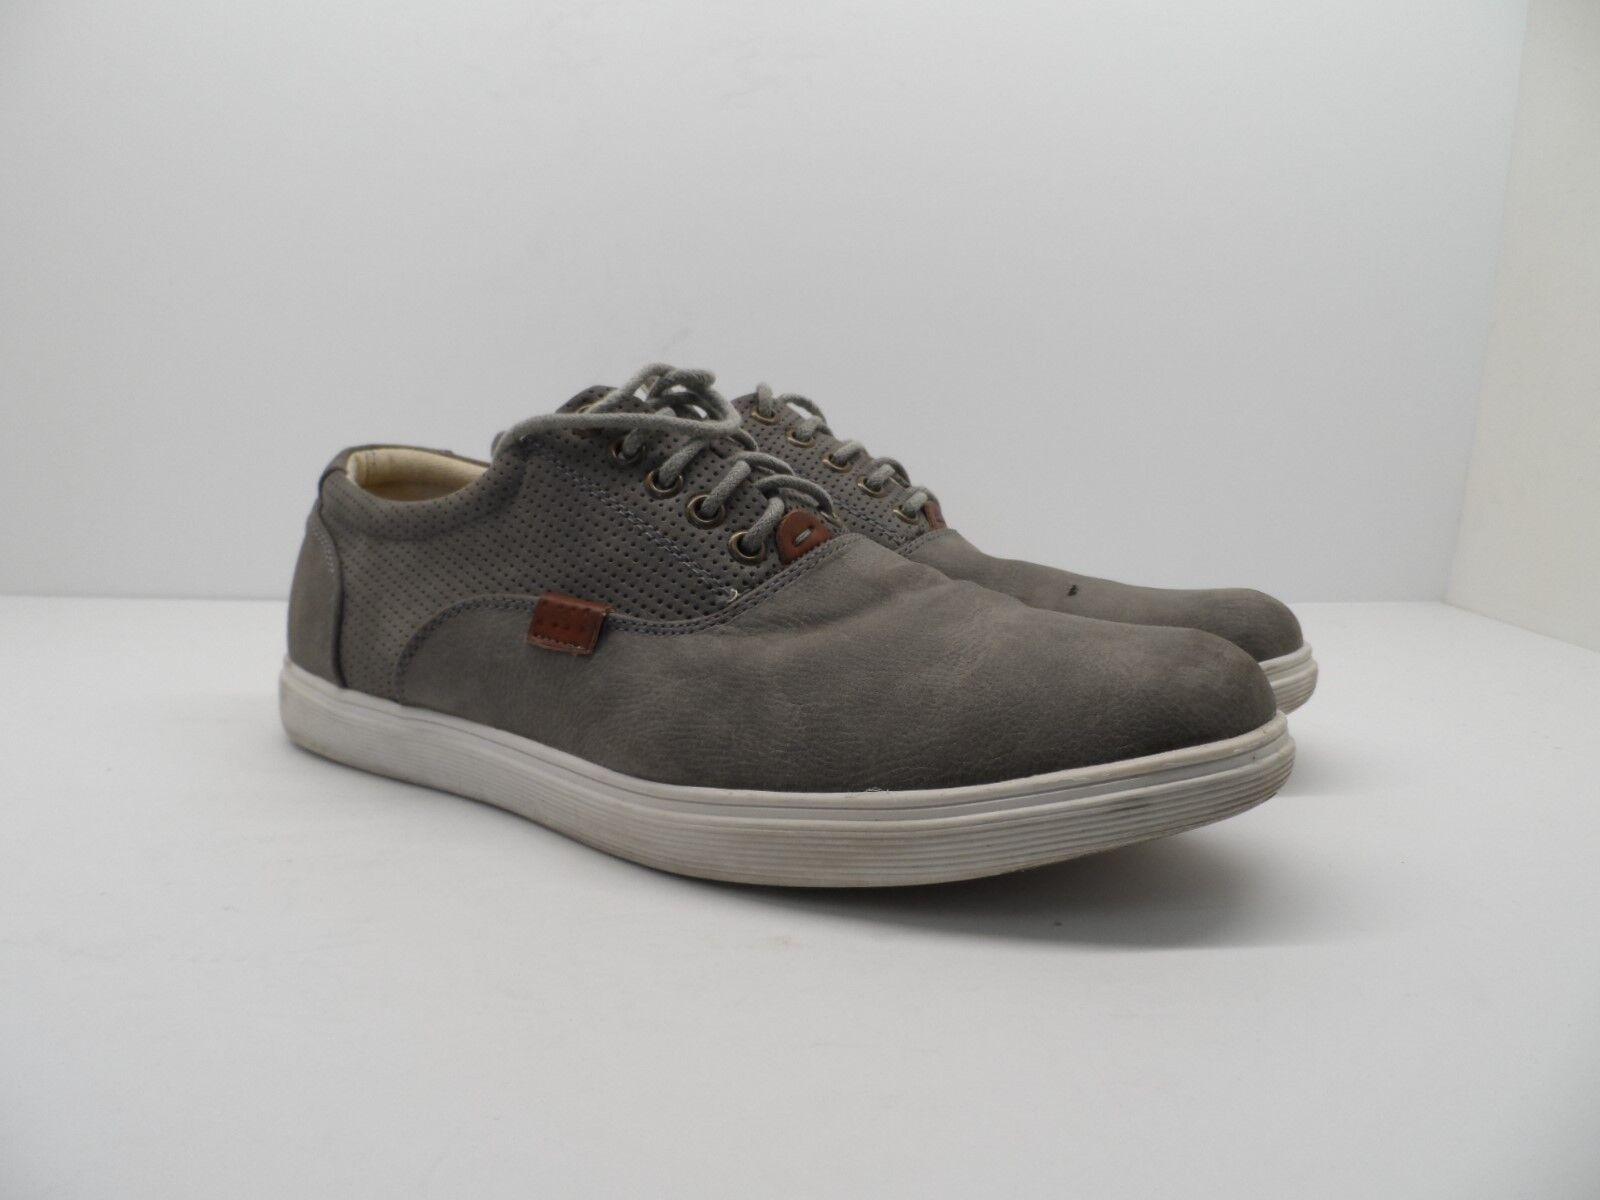 Steve Madden Shoe Men's M-Renold Casual Sneaker Shoe Madden Gray Size 8.5 M 9e83ba